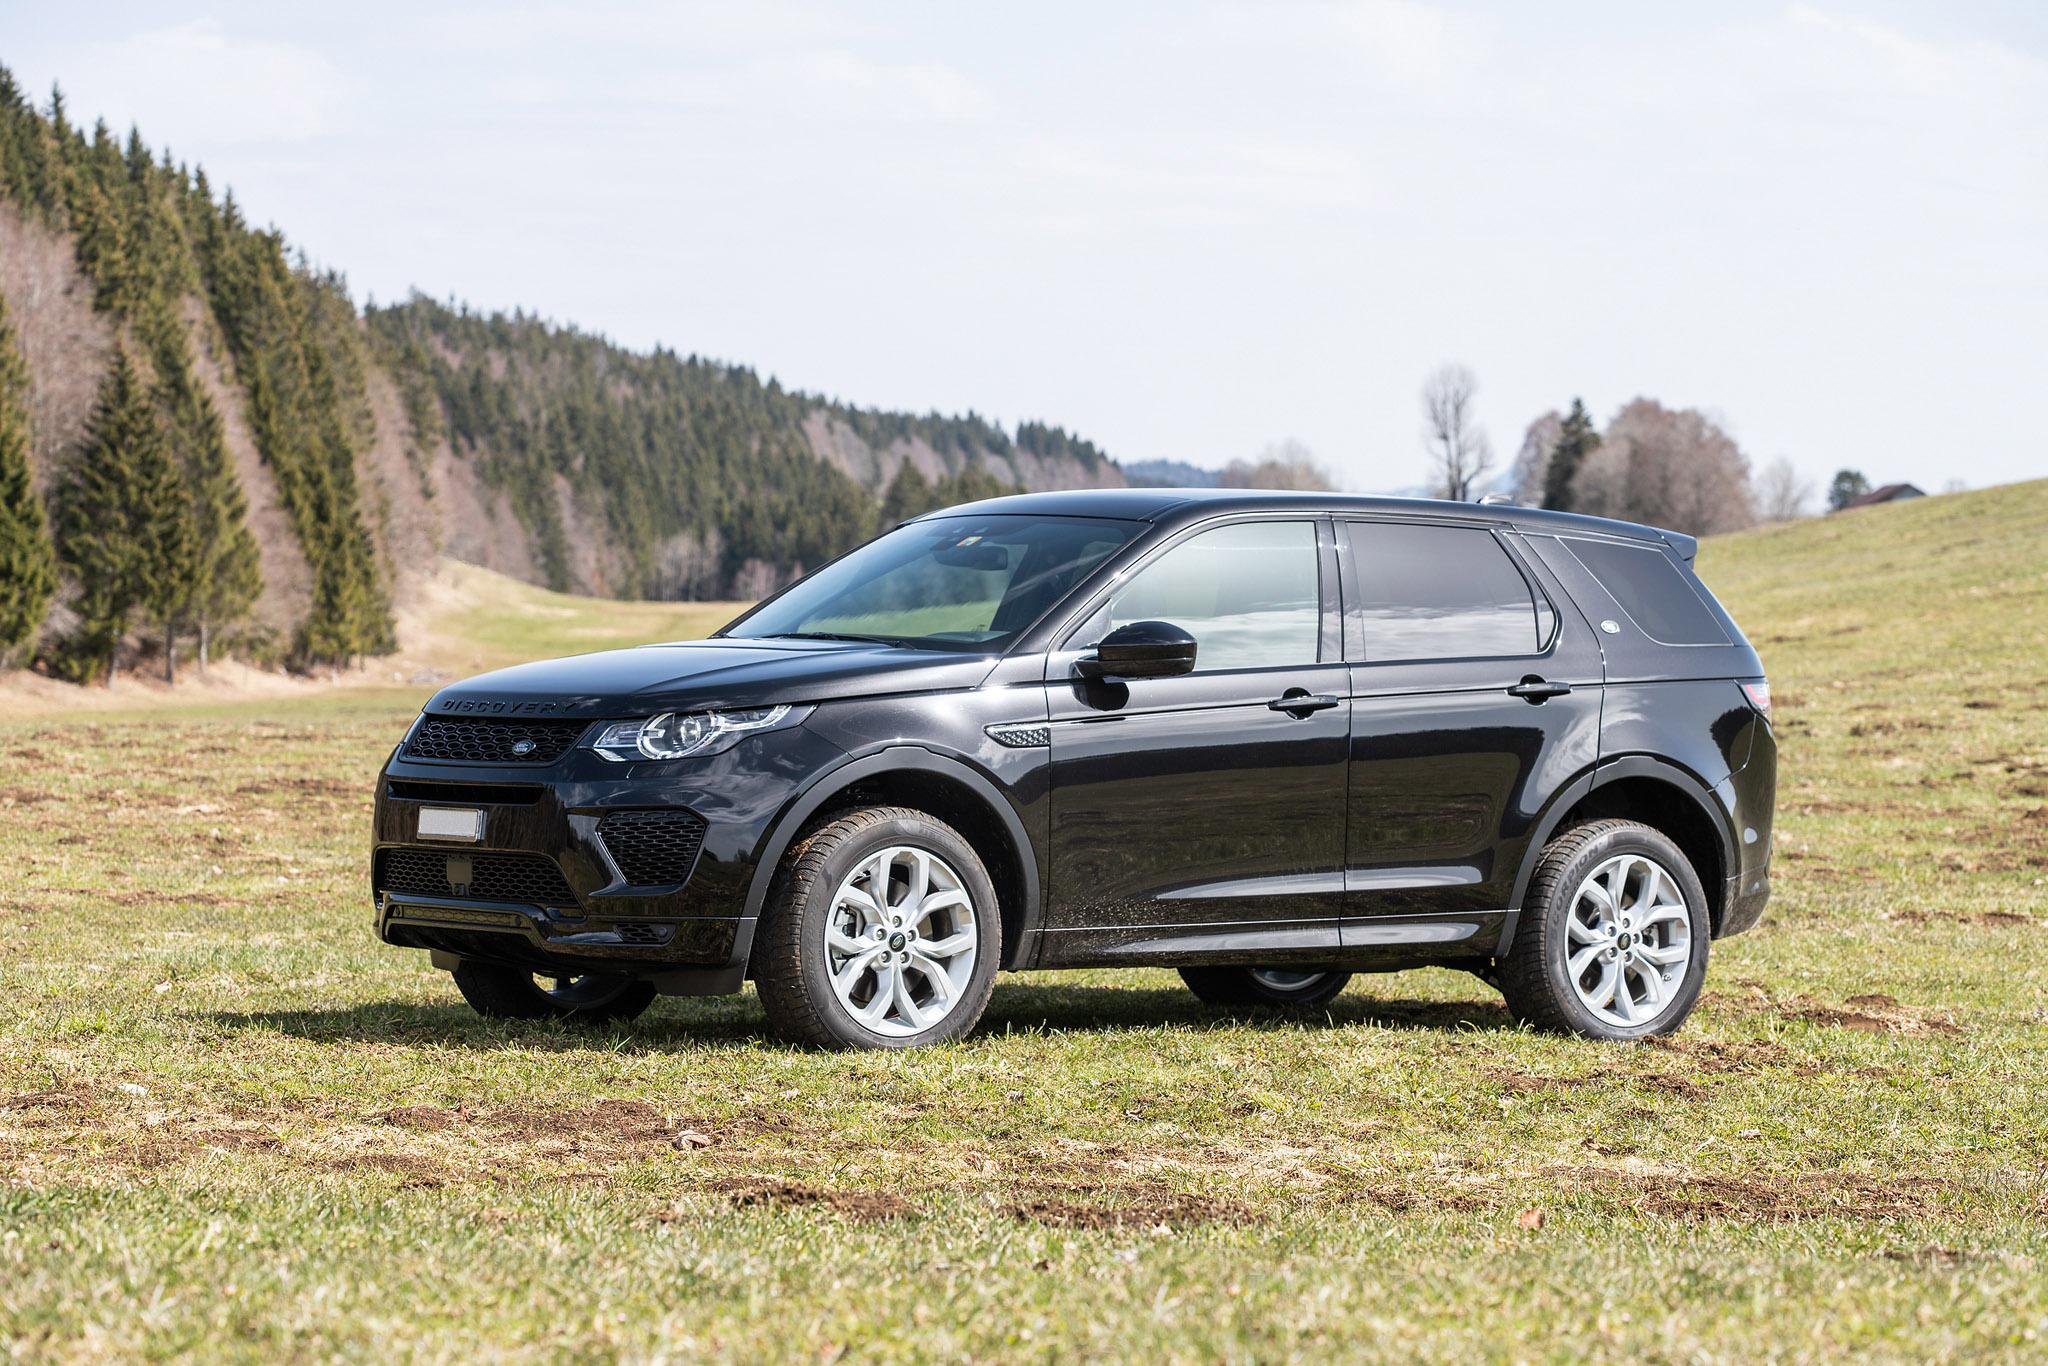 Leasing Land Rover Discovery Sport et Location longue durée LOA